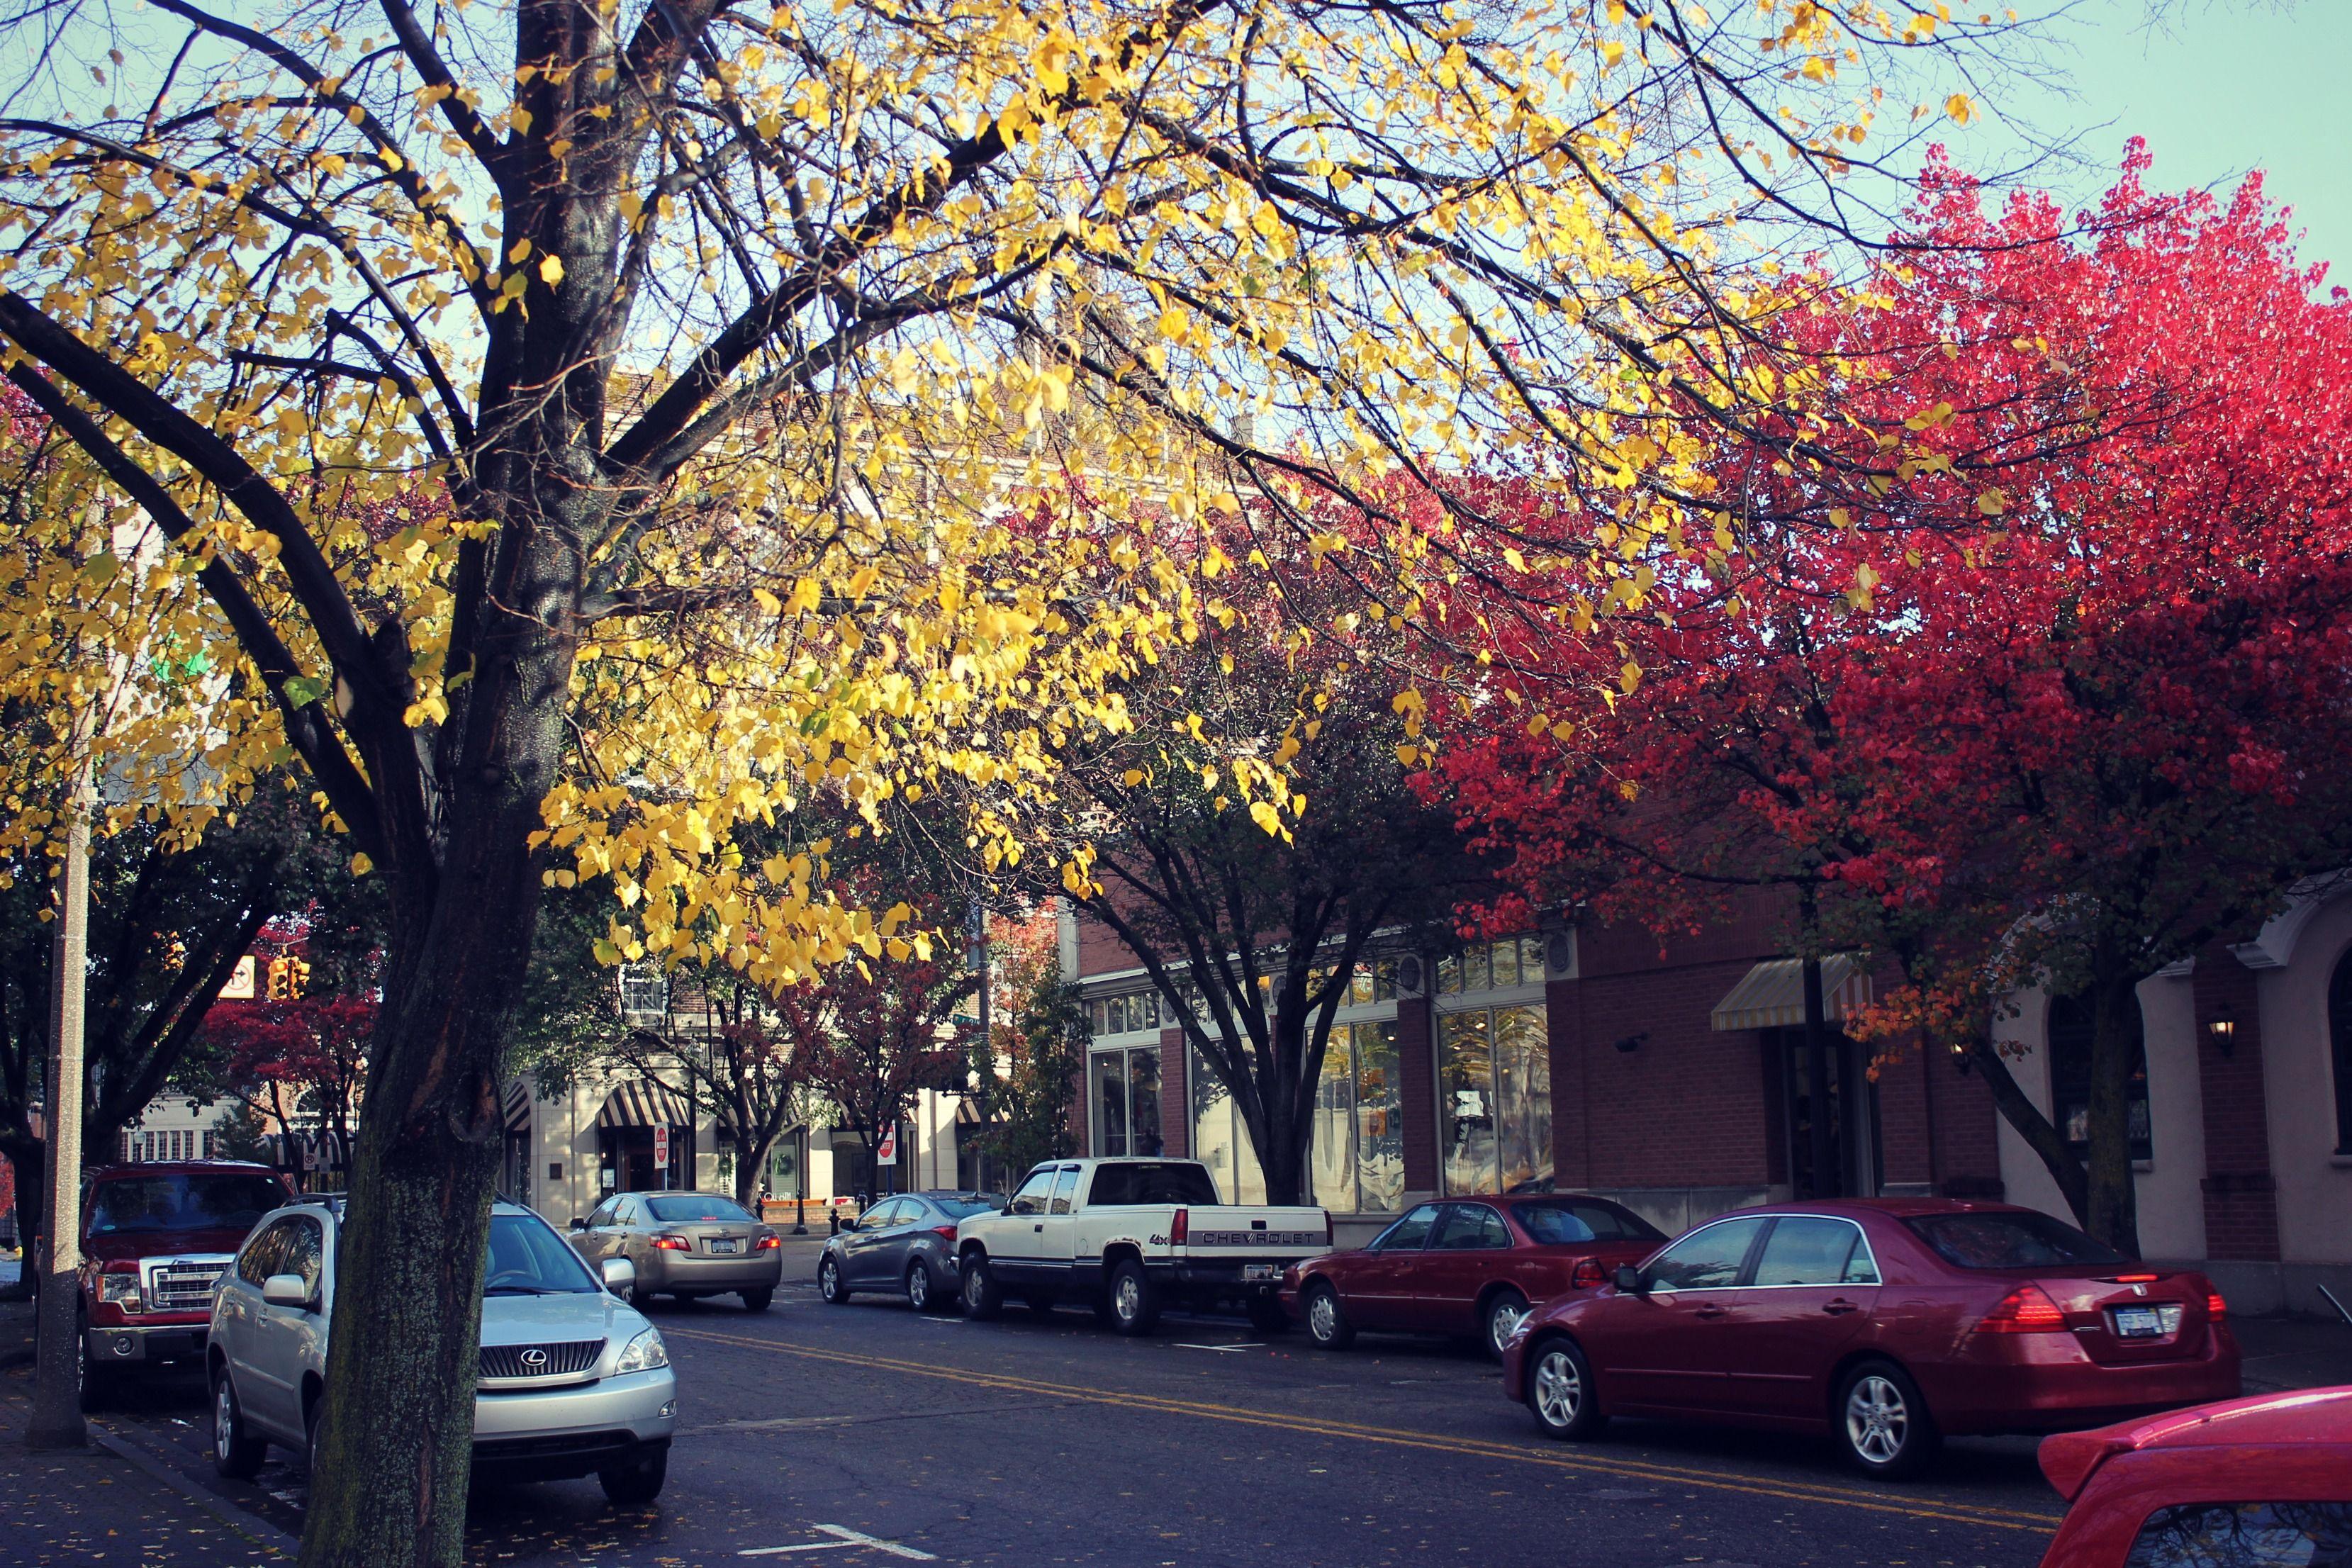 Fall in downtown holland mi